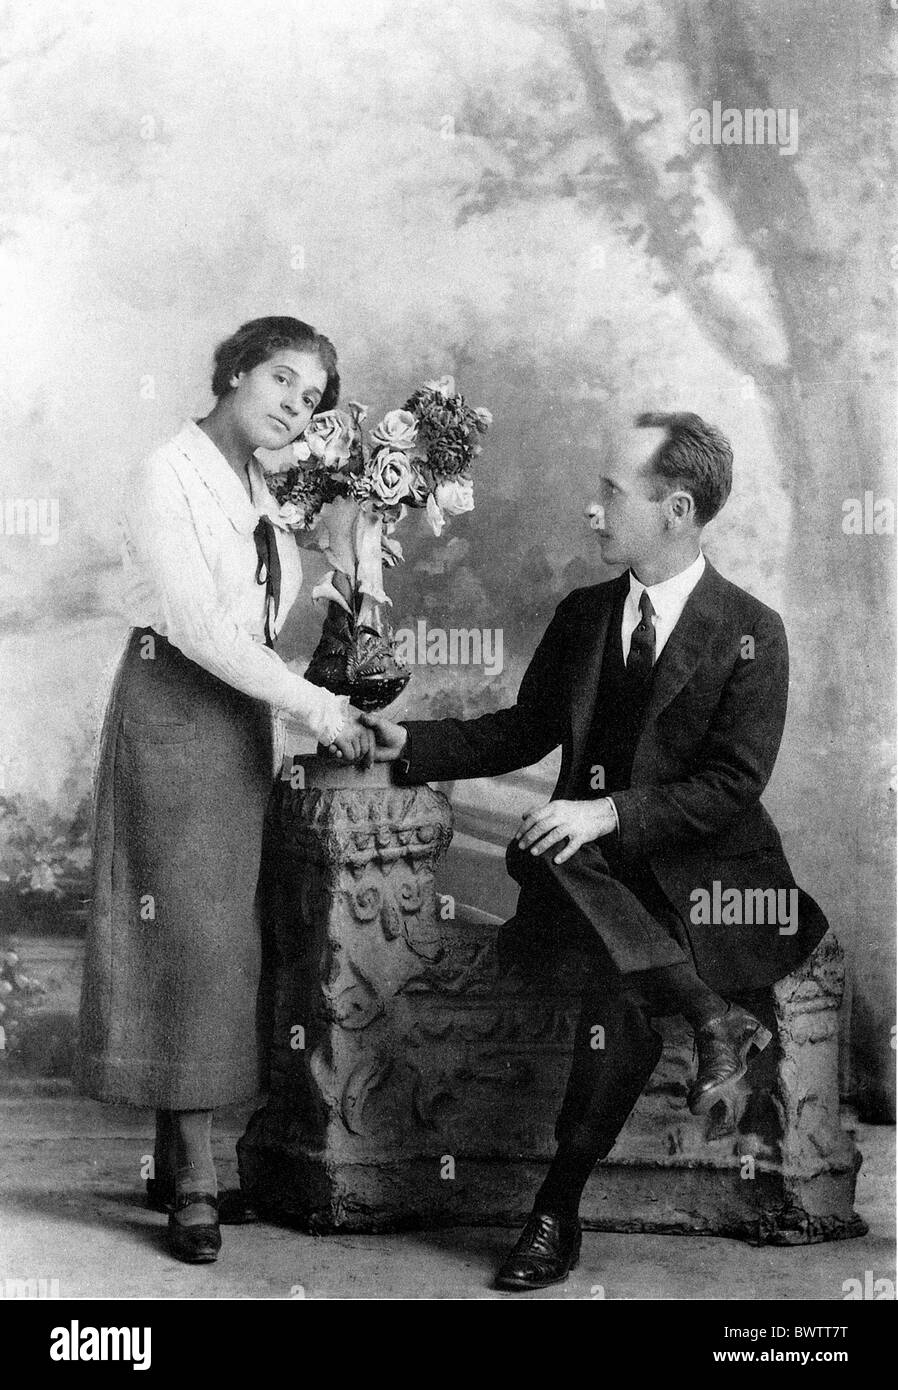 Edward Weston Tina Modotti arrival flowers Mexico Central America America artist 1924 photography history h - Stock Image